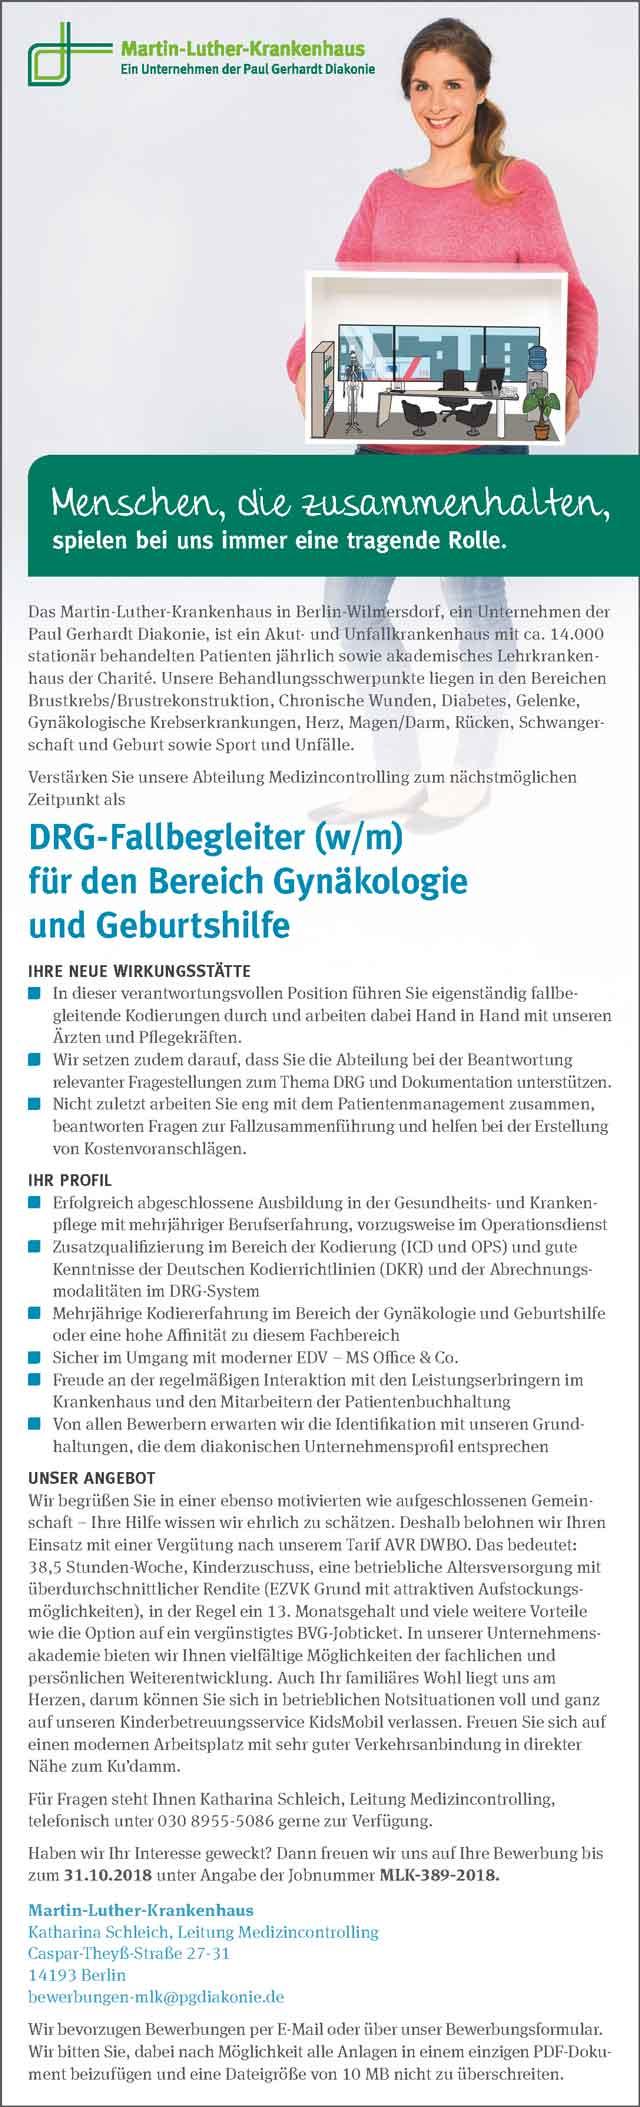 Martin-Luther-Krankenhaus Berlin-Wilmersdorf: DRG-Fallbegleiter (w/m)